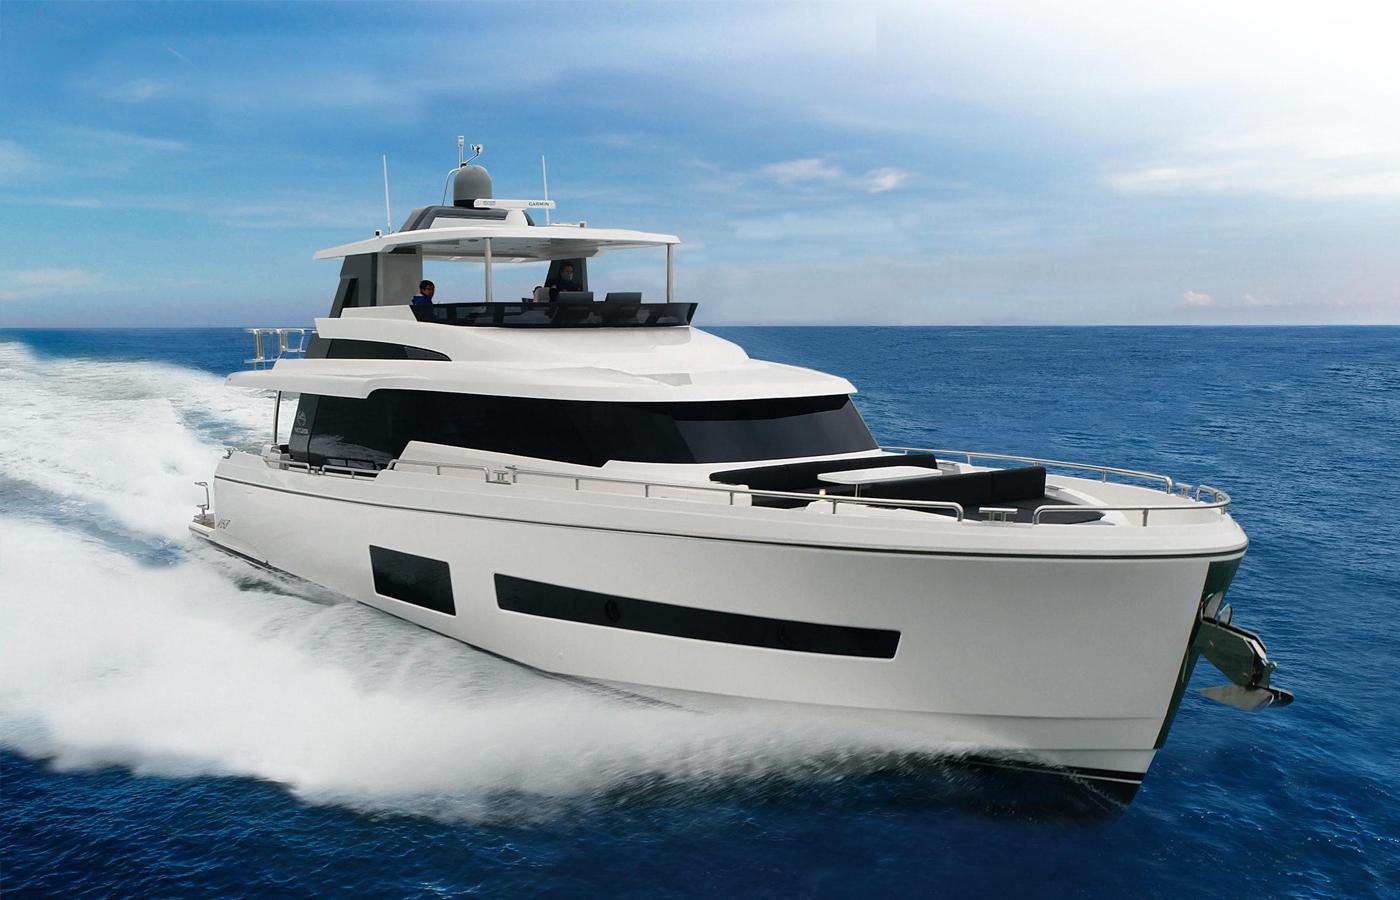 Yacht Review: Horizon V68 [New Model]